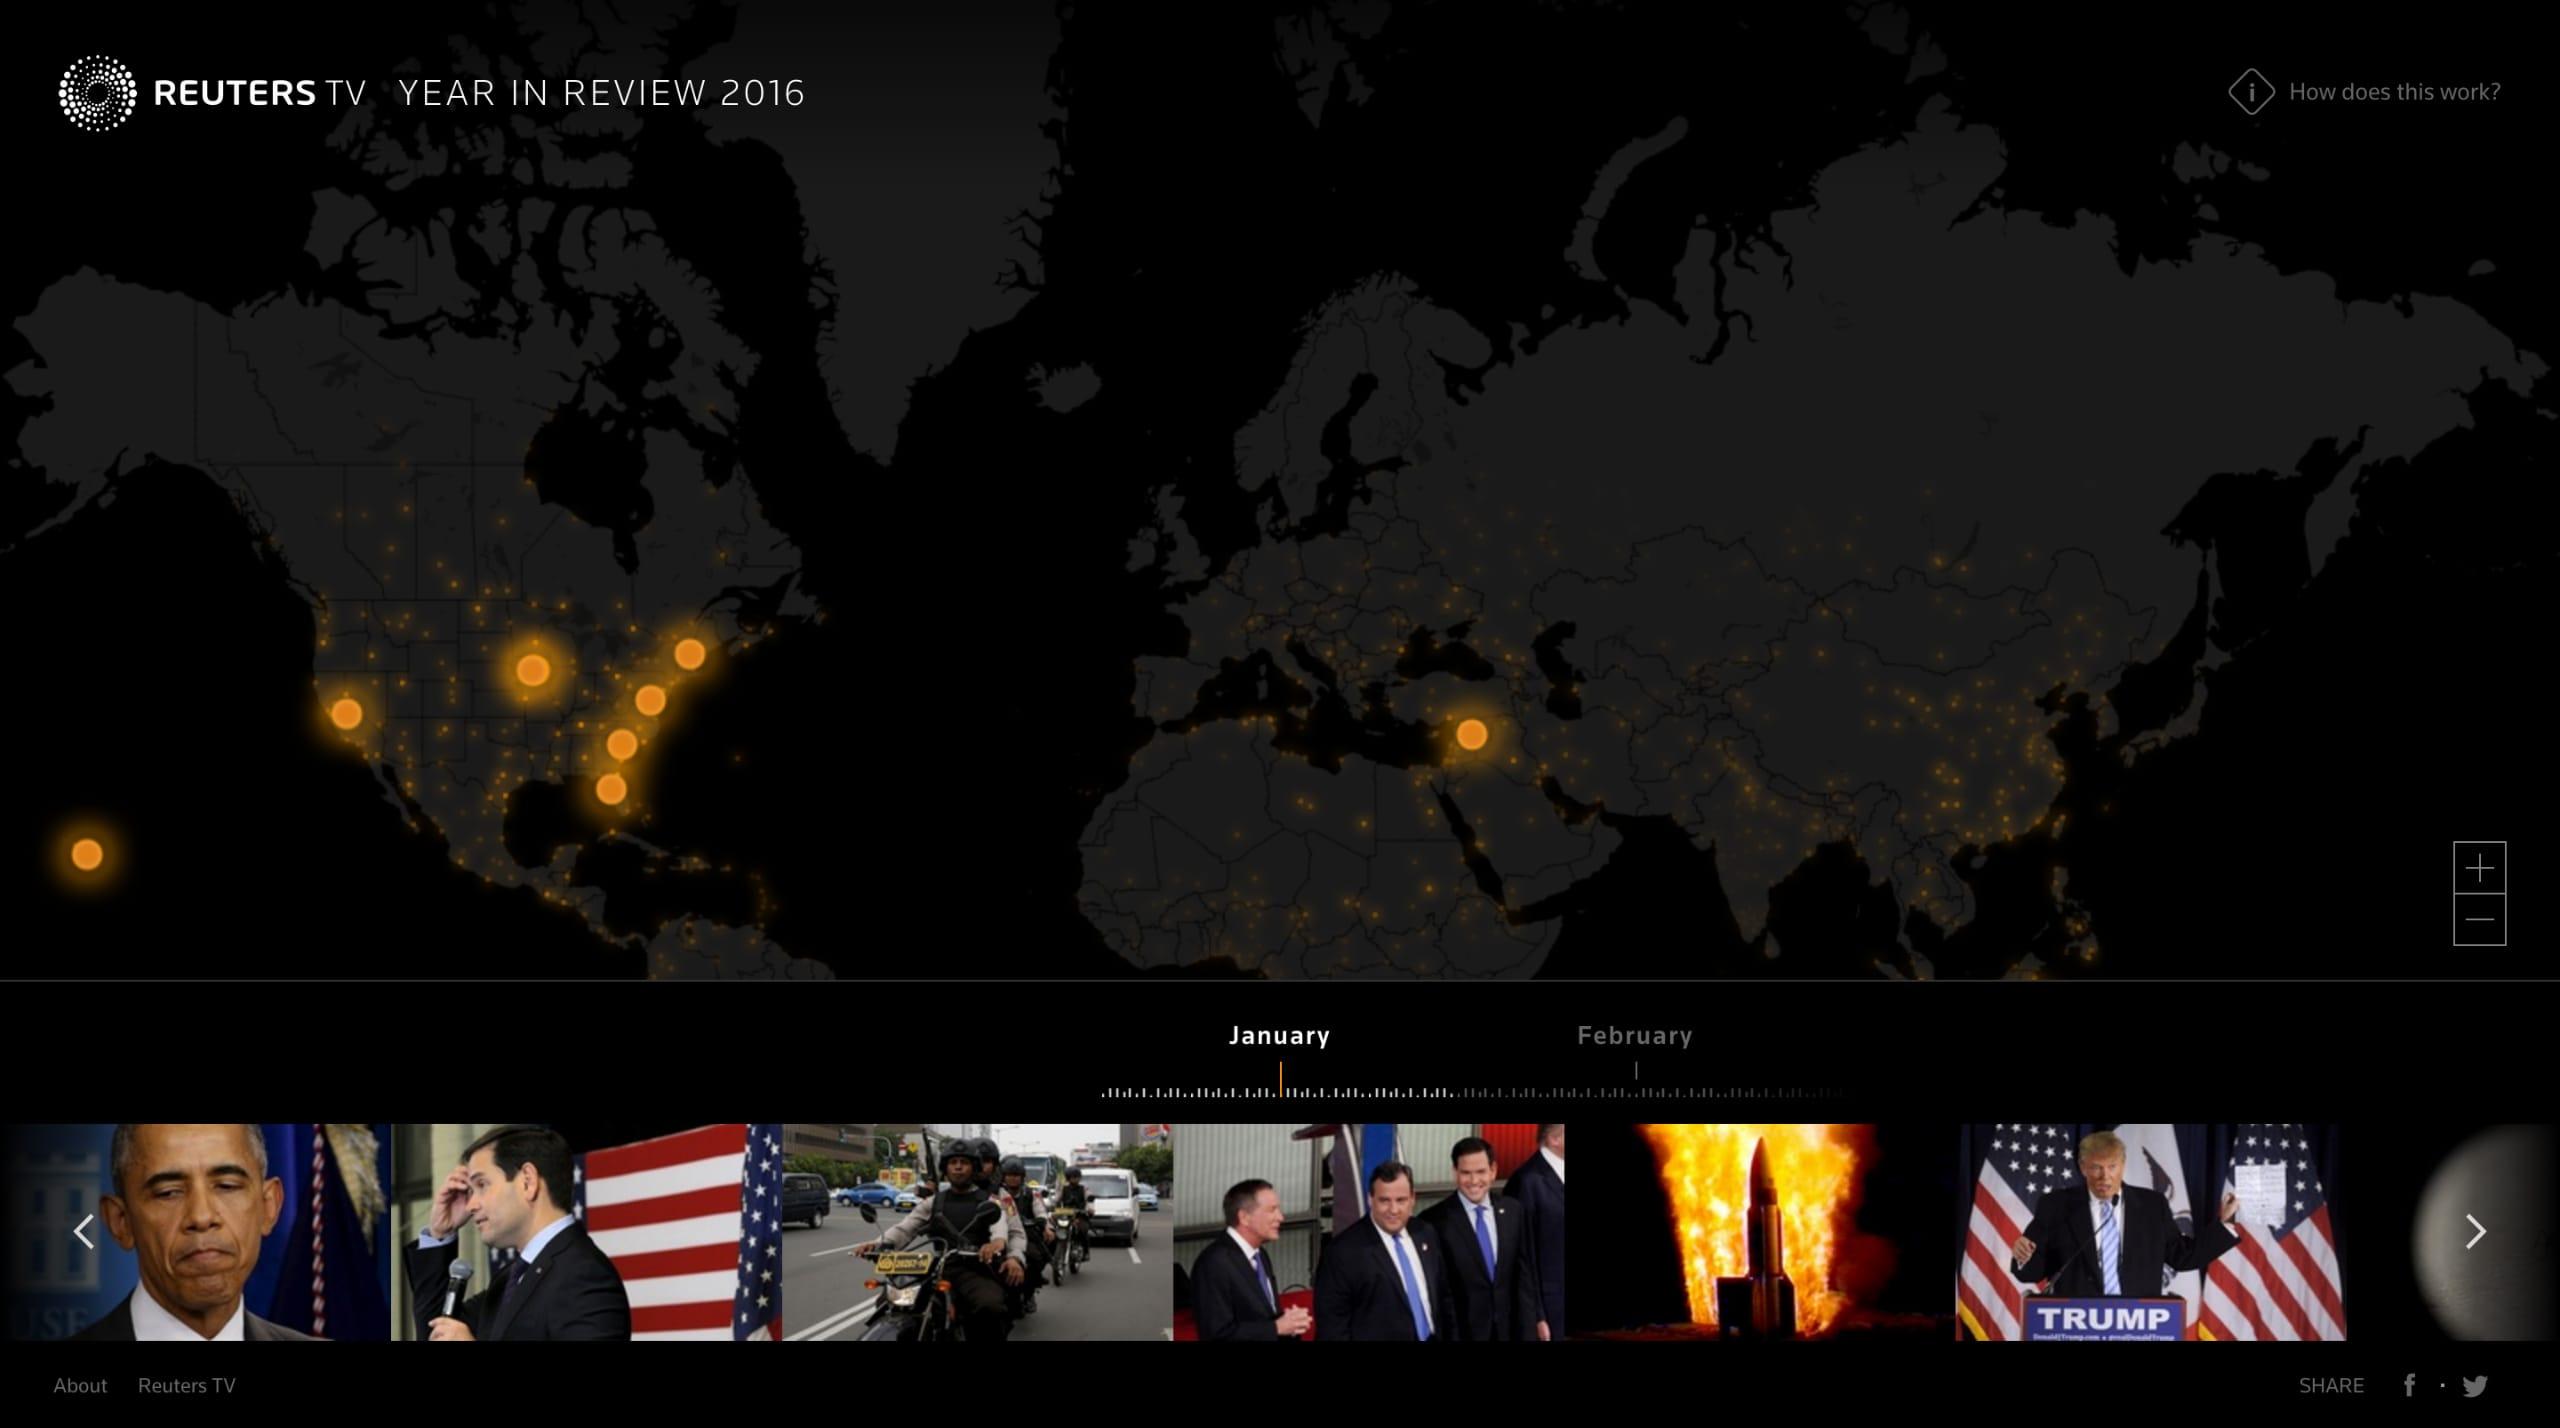 Reuters TV: 2016 Year in Review Website Screenshot